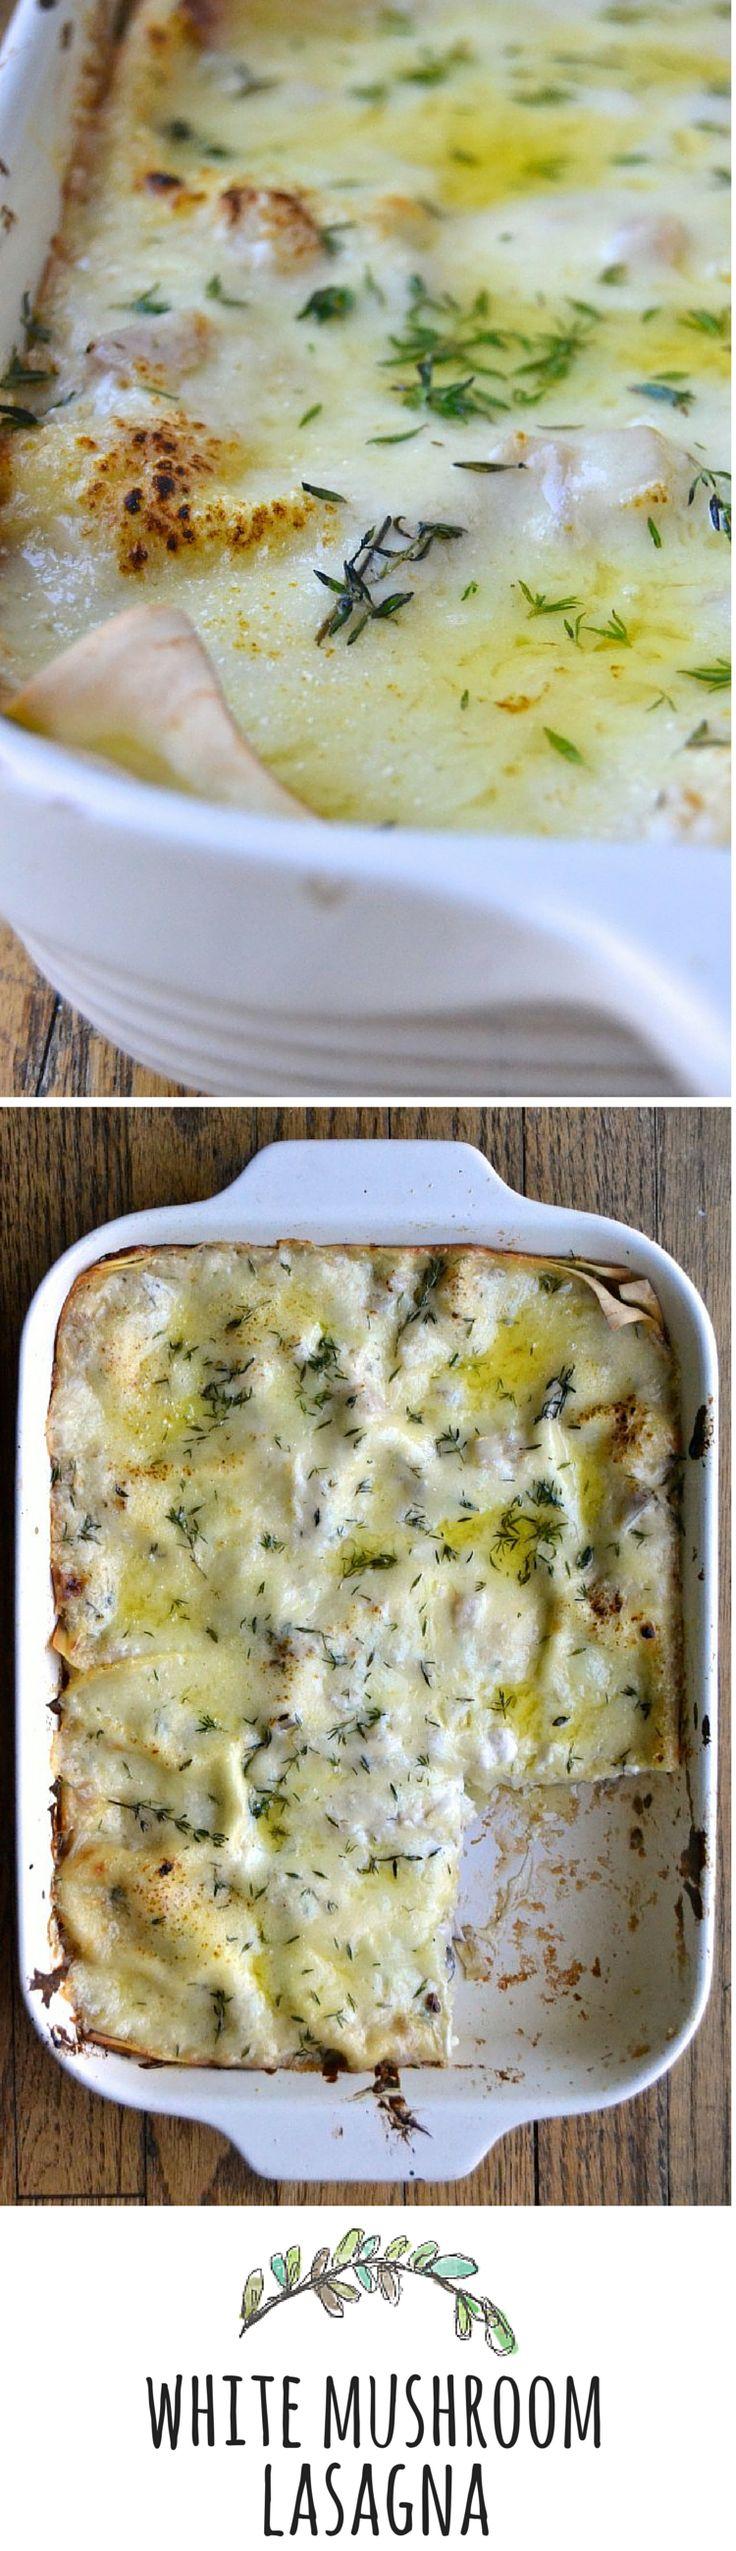 white mushroom lasagna #vegetarian #dinner